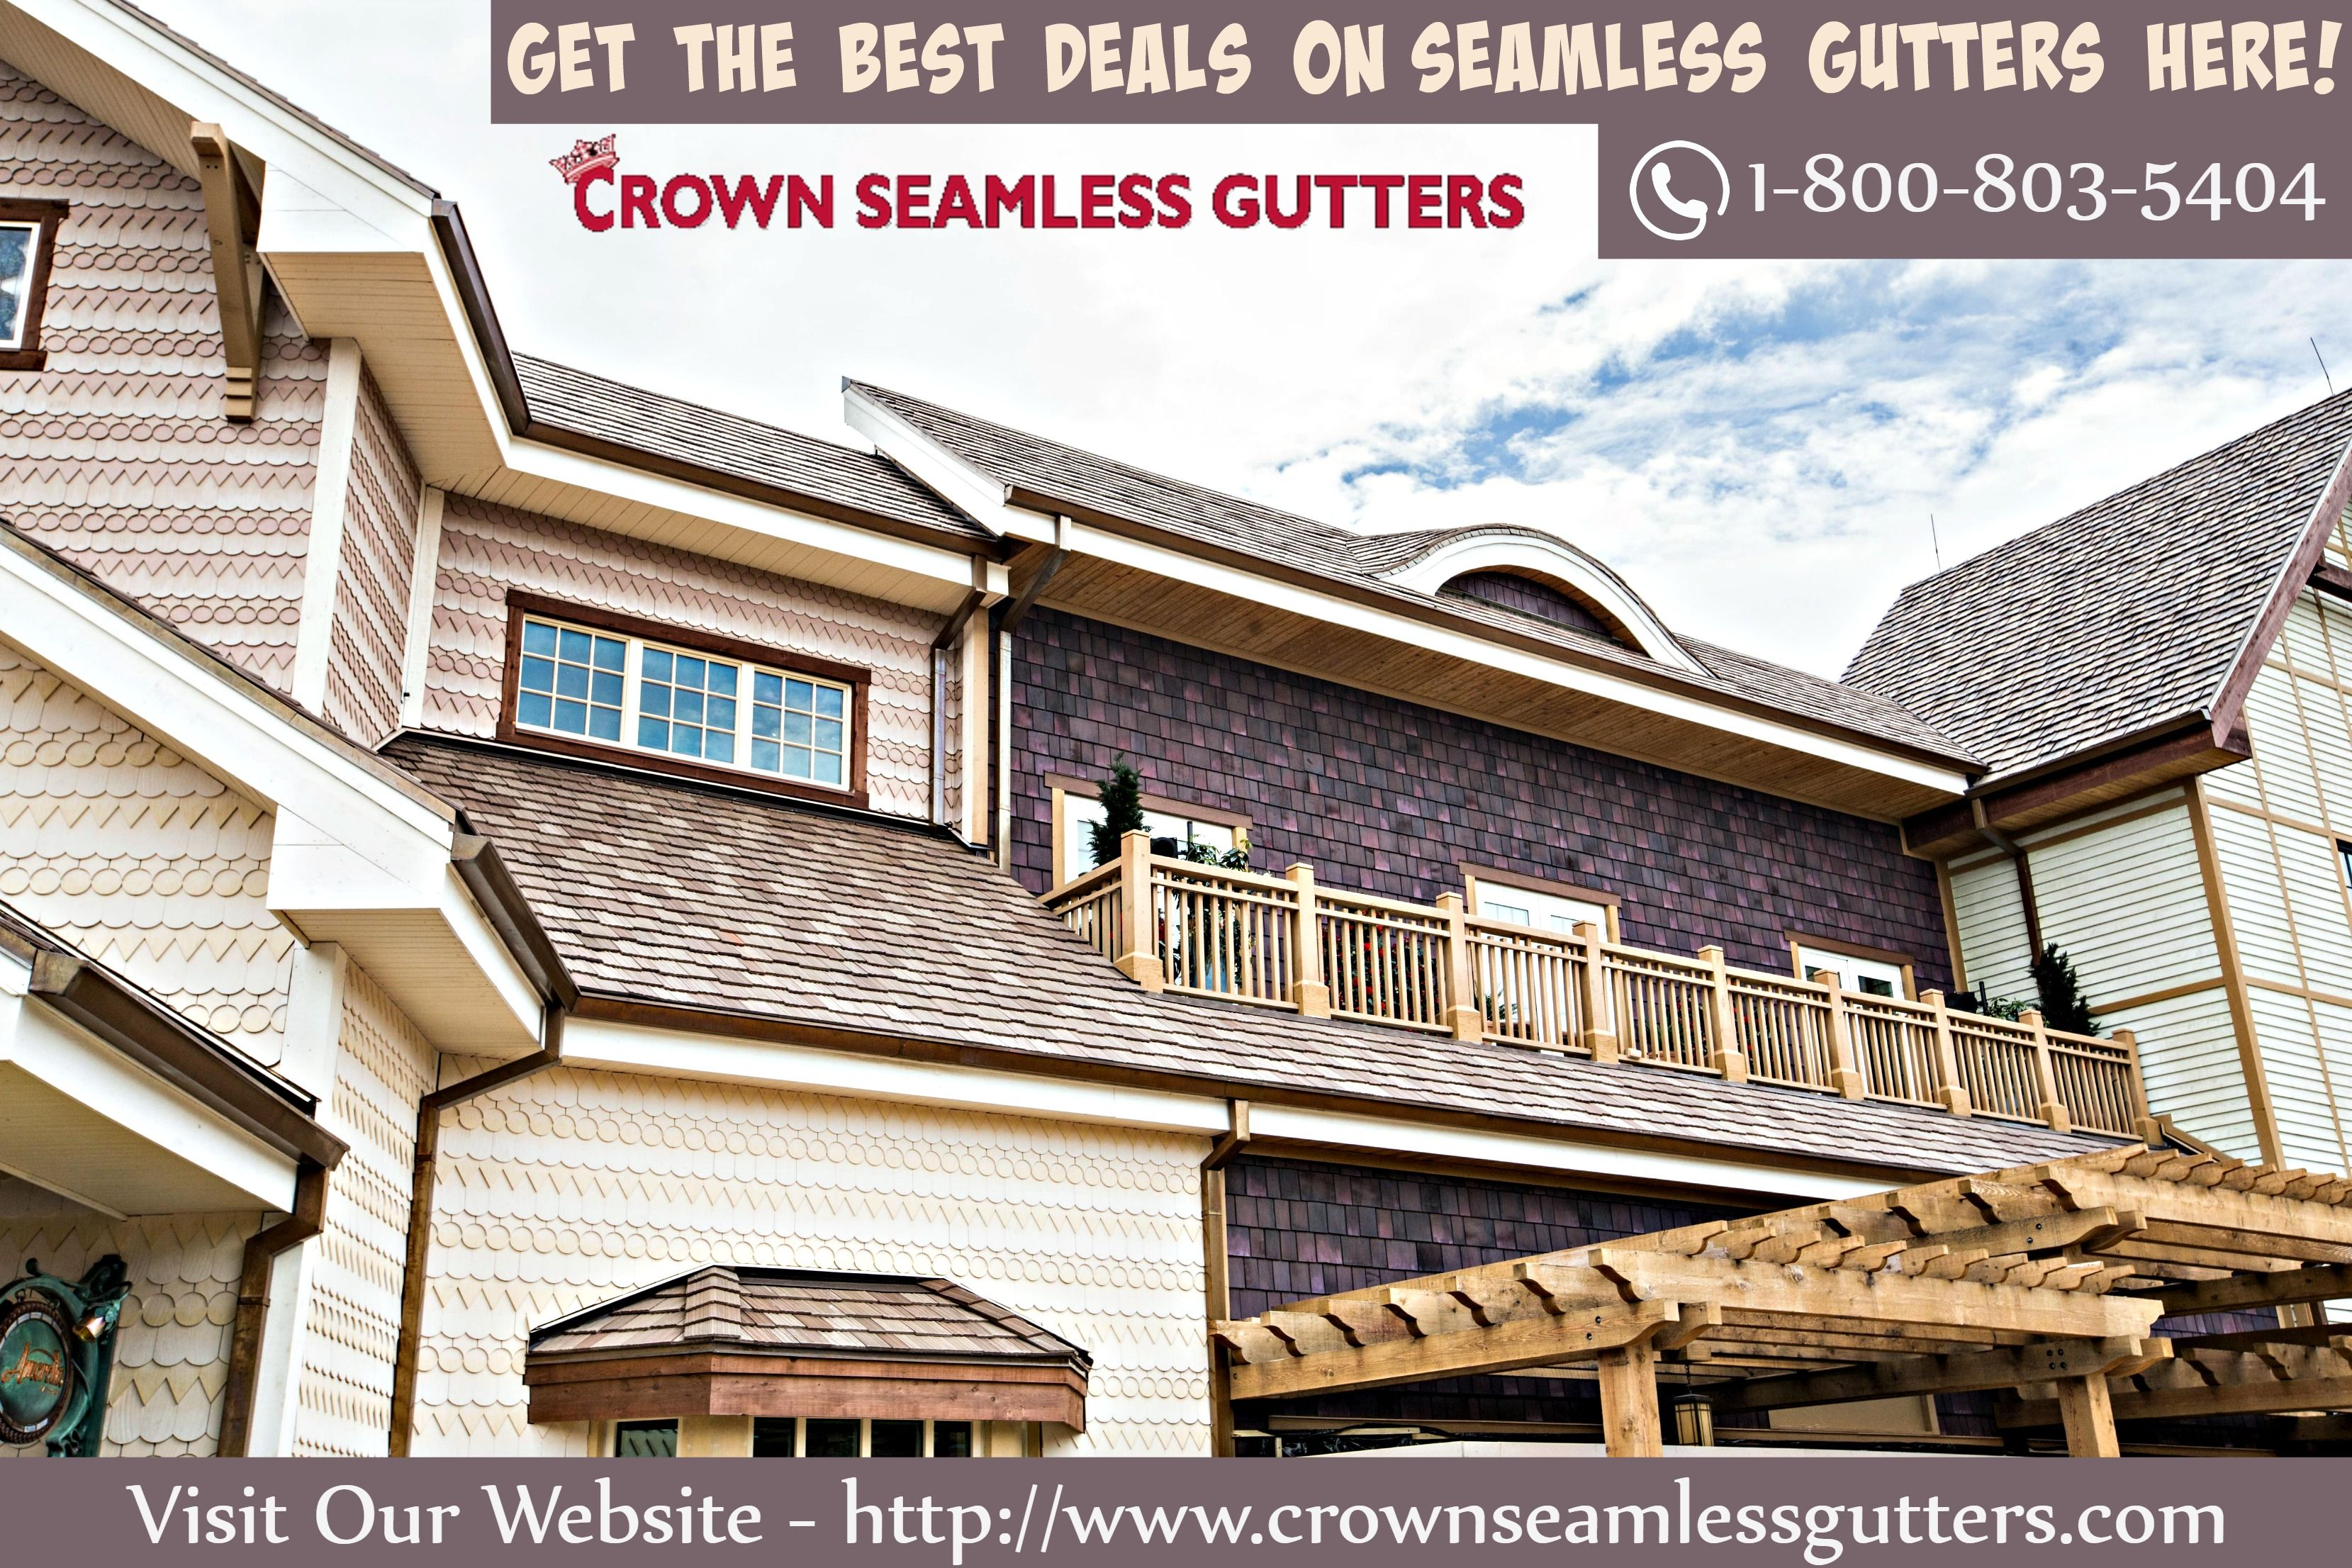 Seamless Gutters Installation & Repair in Florida